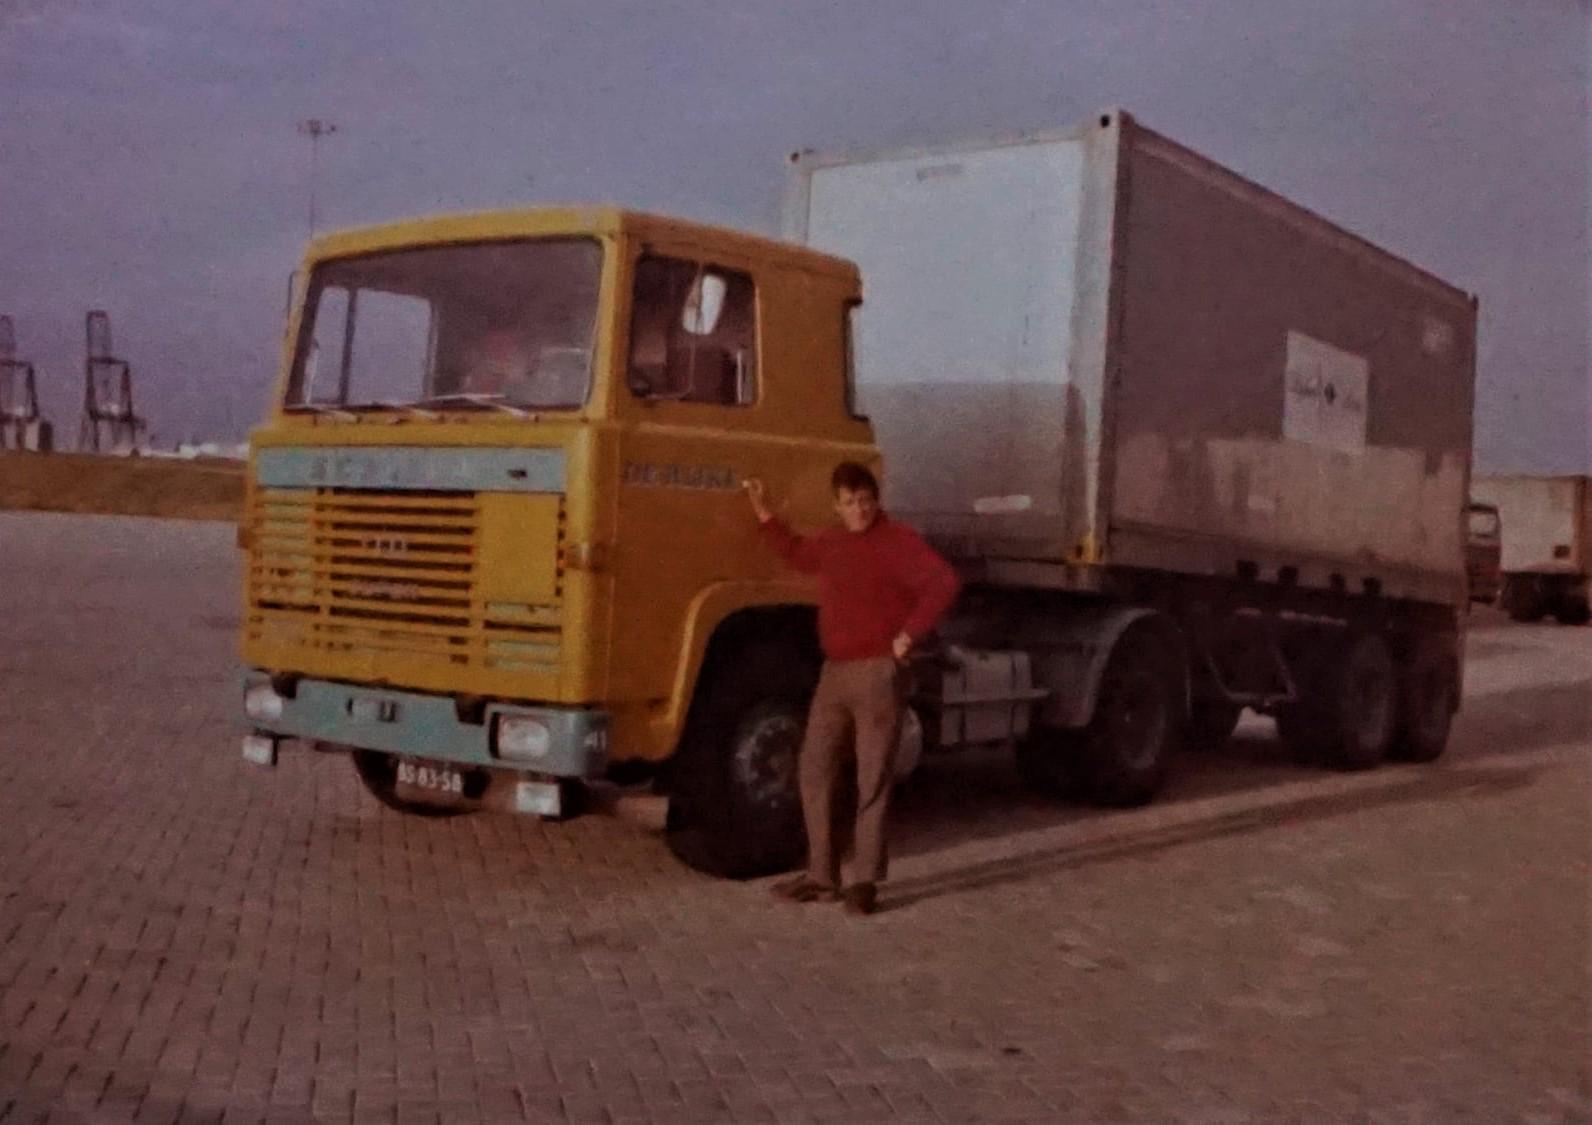 Cor--Winkelman-1965--1970---3